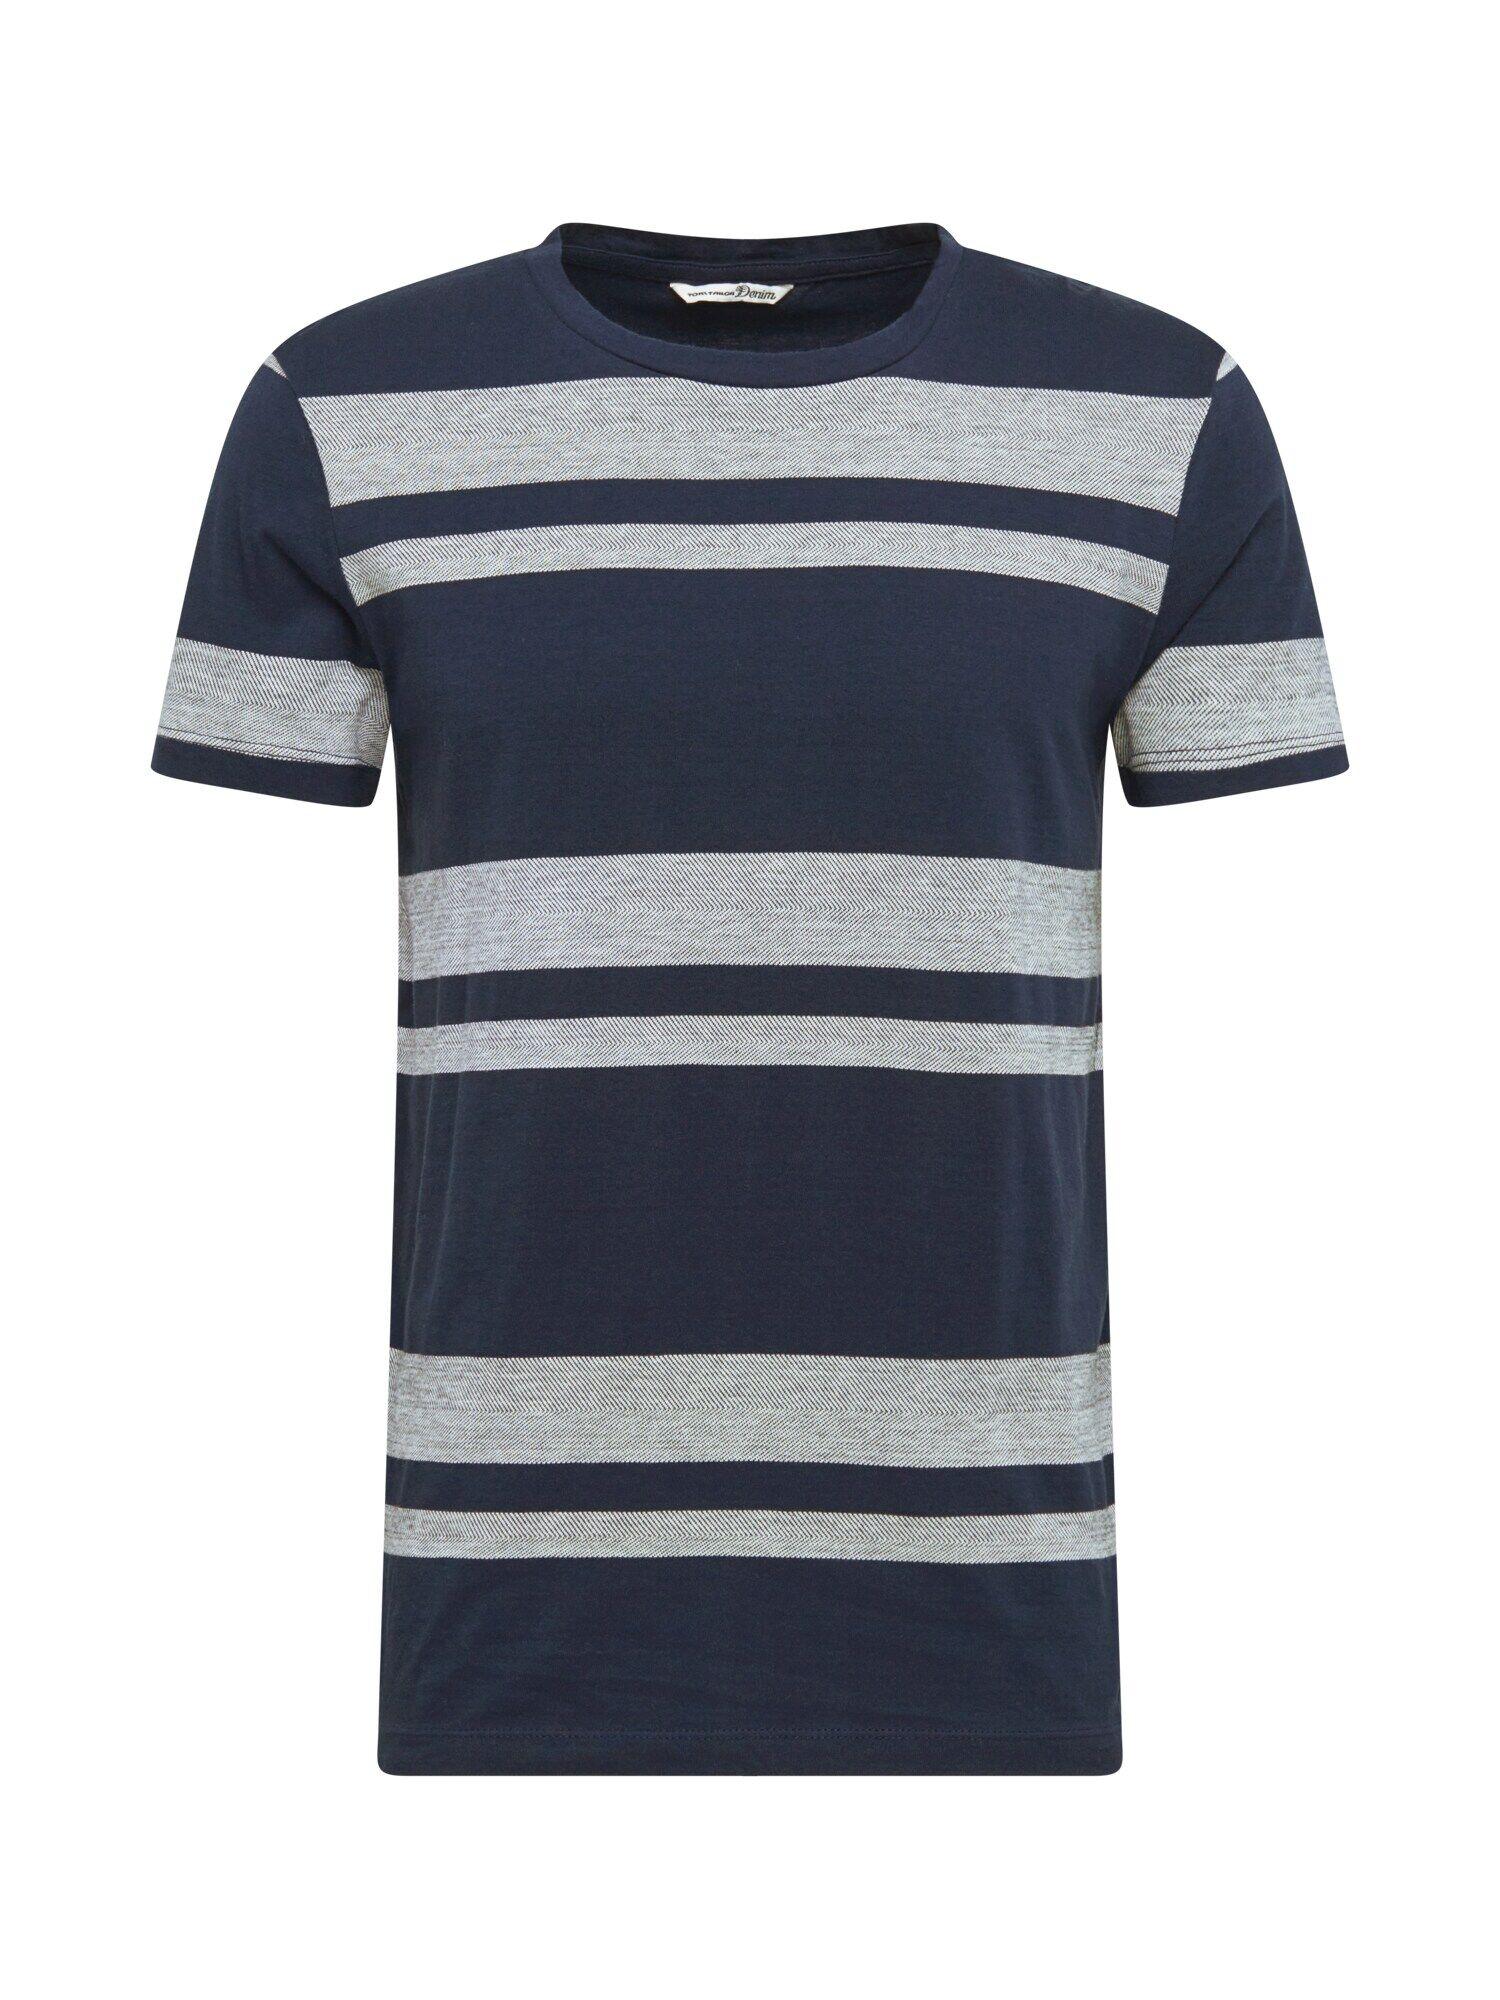 TOM TAILOR DENIM T-Shirt  - Bleu - Taille: L - male